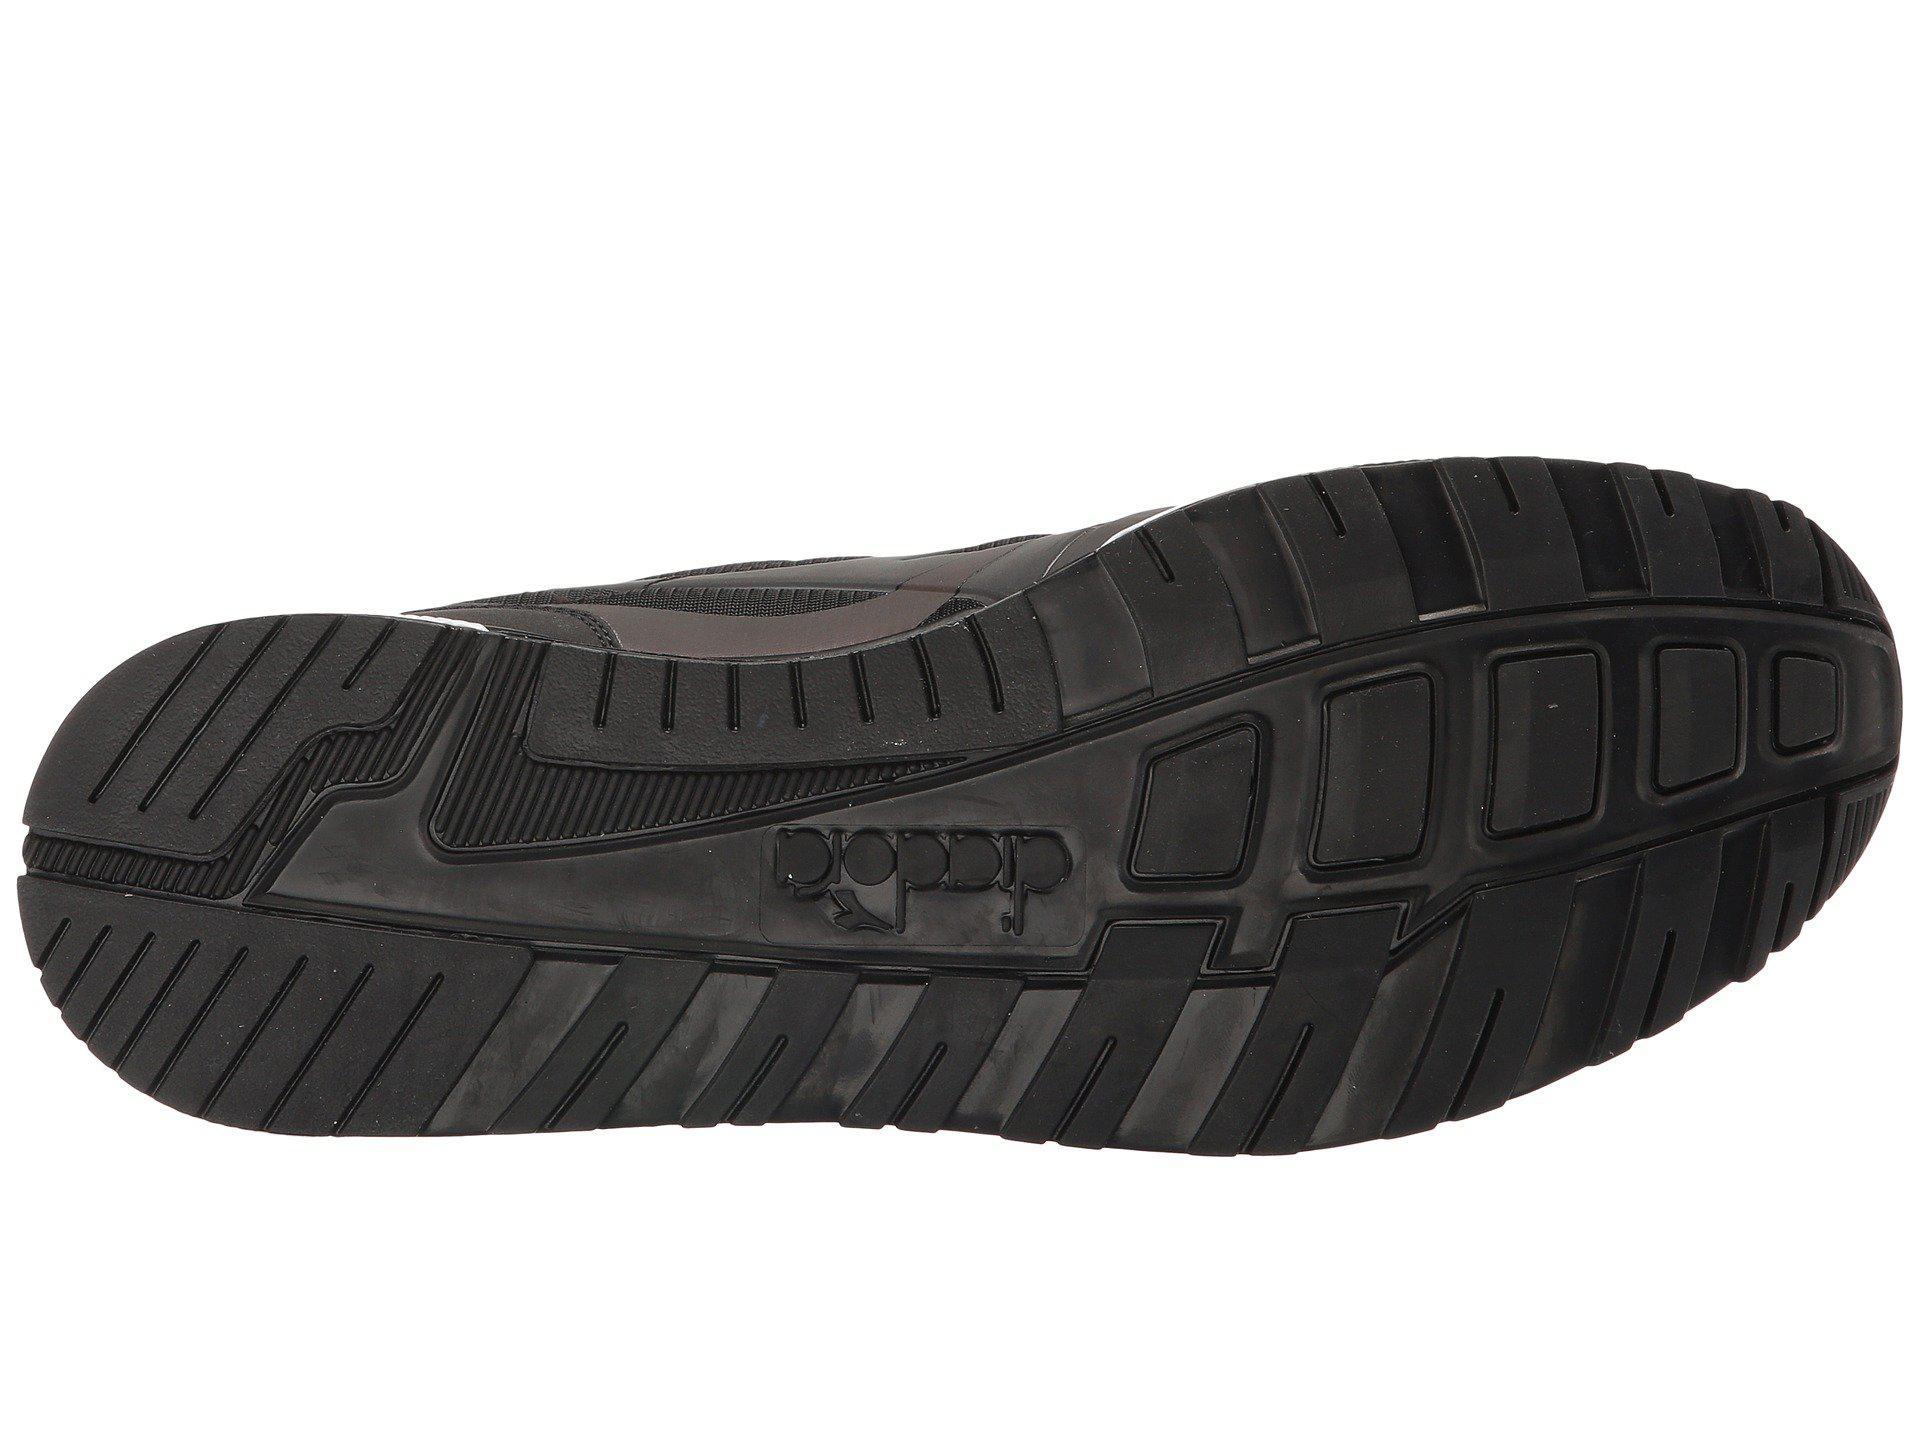 huge discount 190ec 875c3 Diadora N9000 Mm Hologram in Black for Men - Lyst